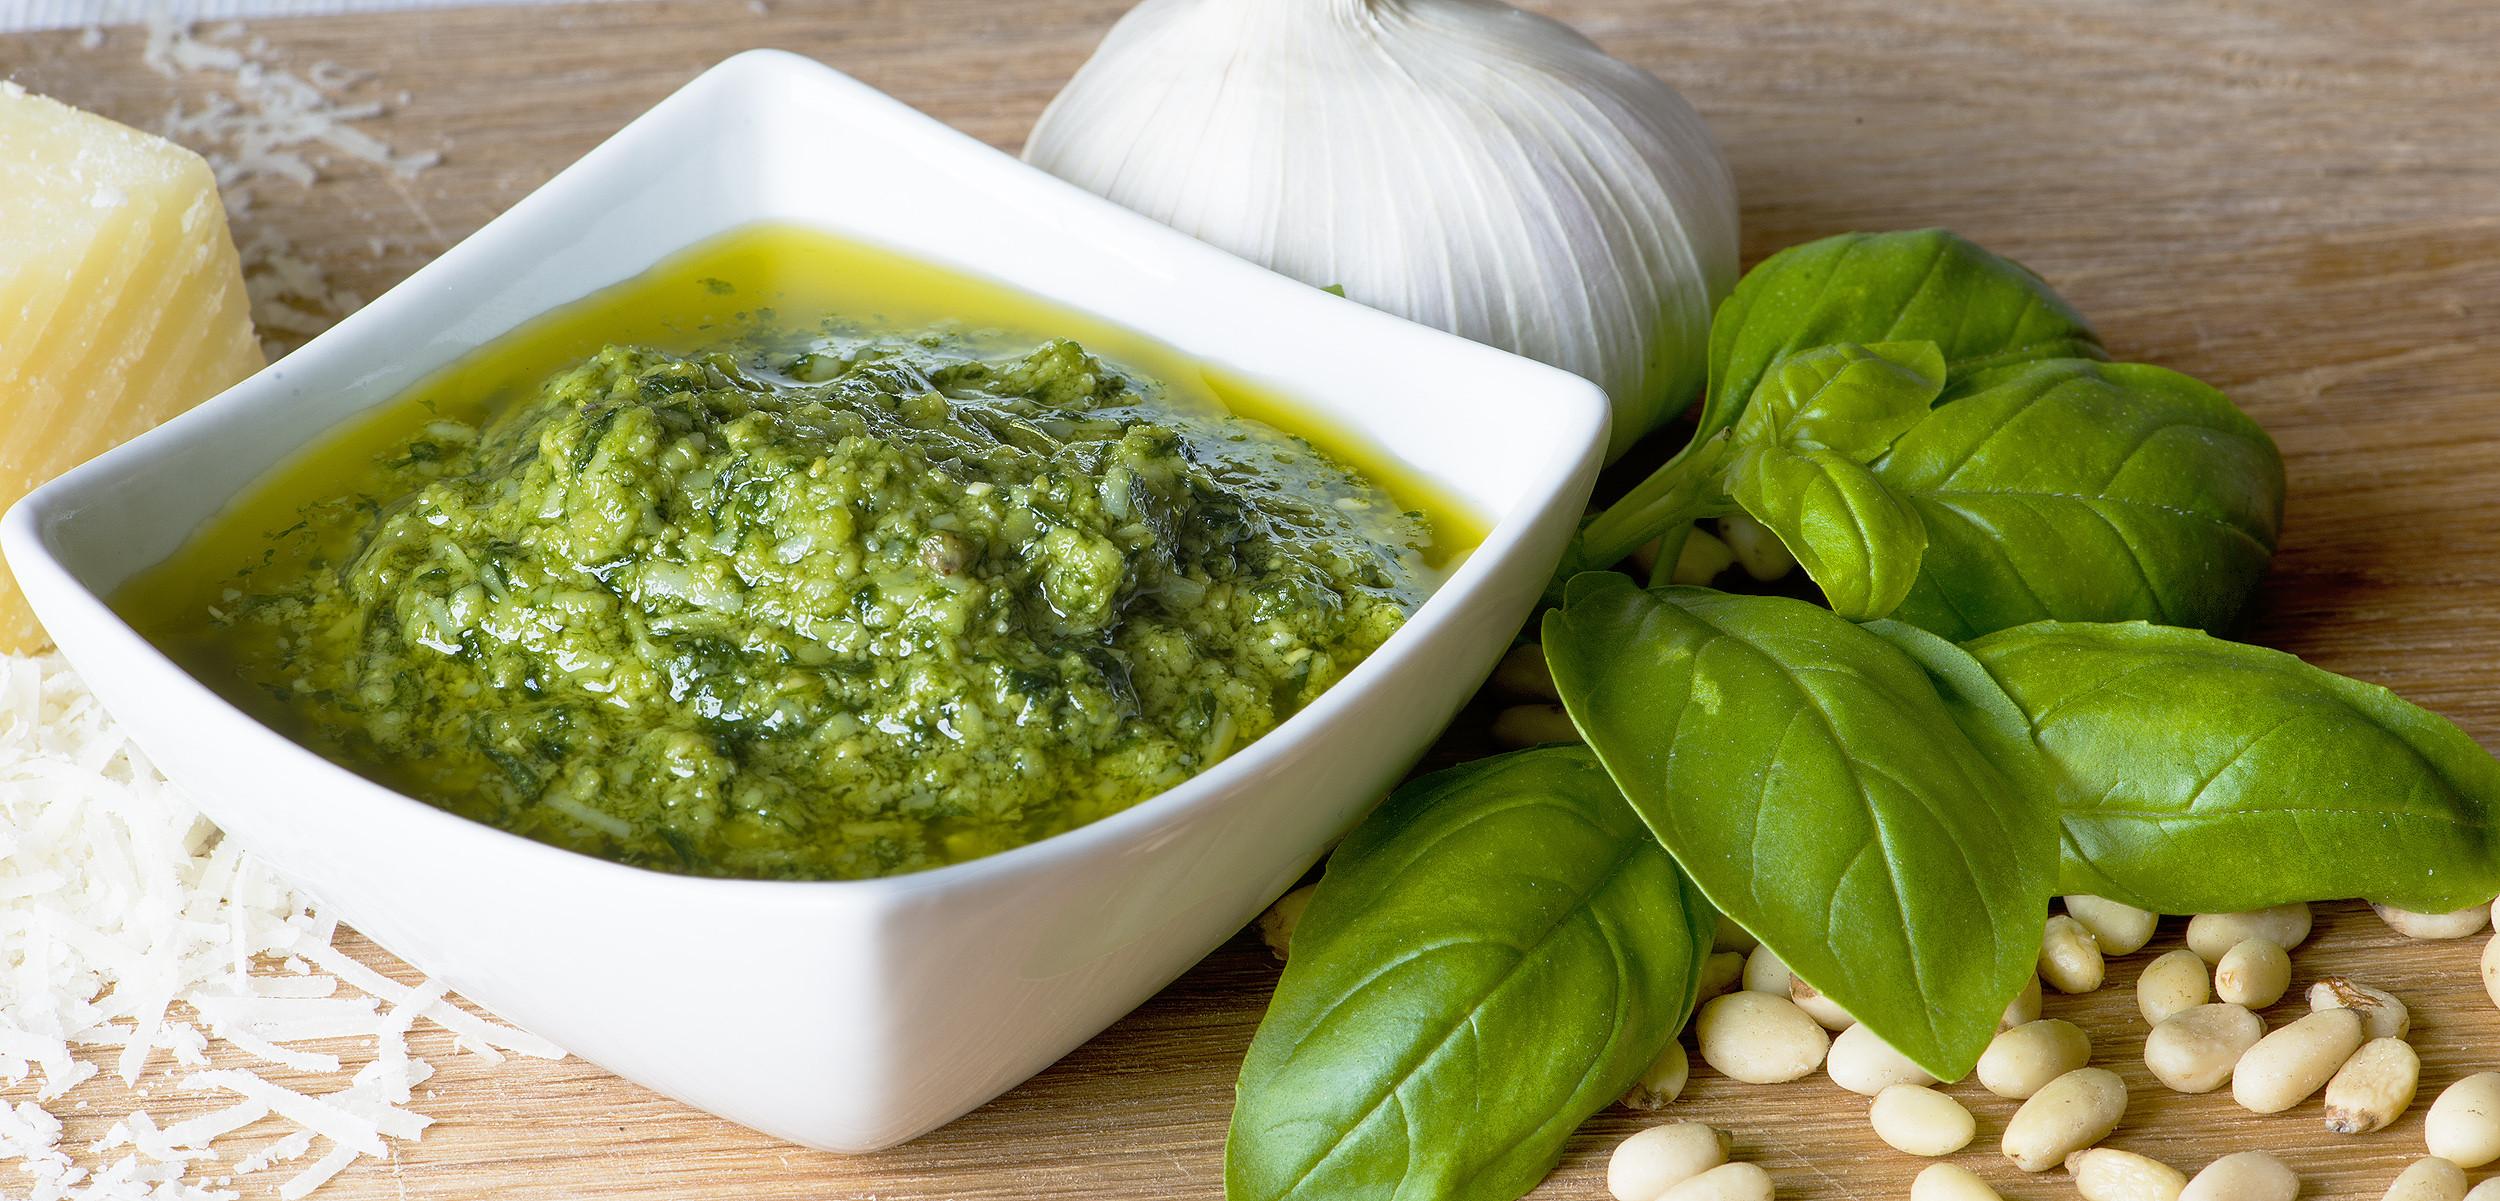 Healthy Pesto Sauce  Make Your Own Healthy Pesto Sauce